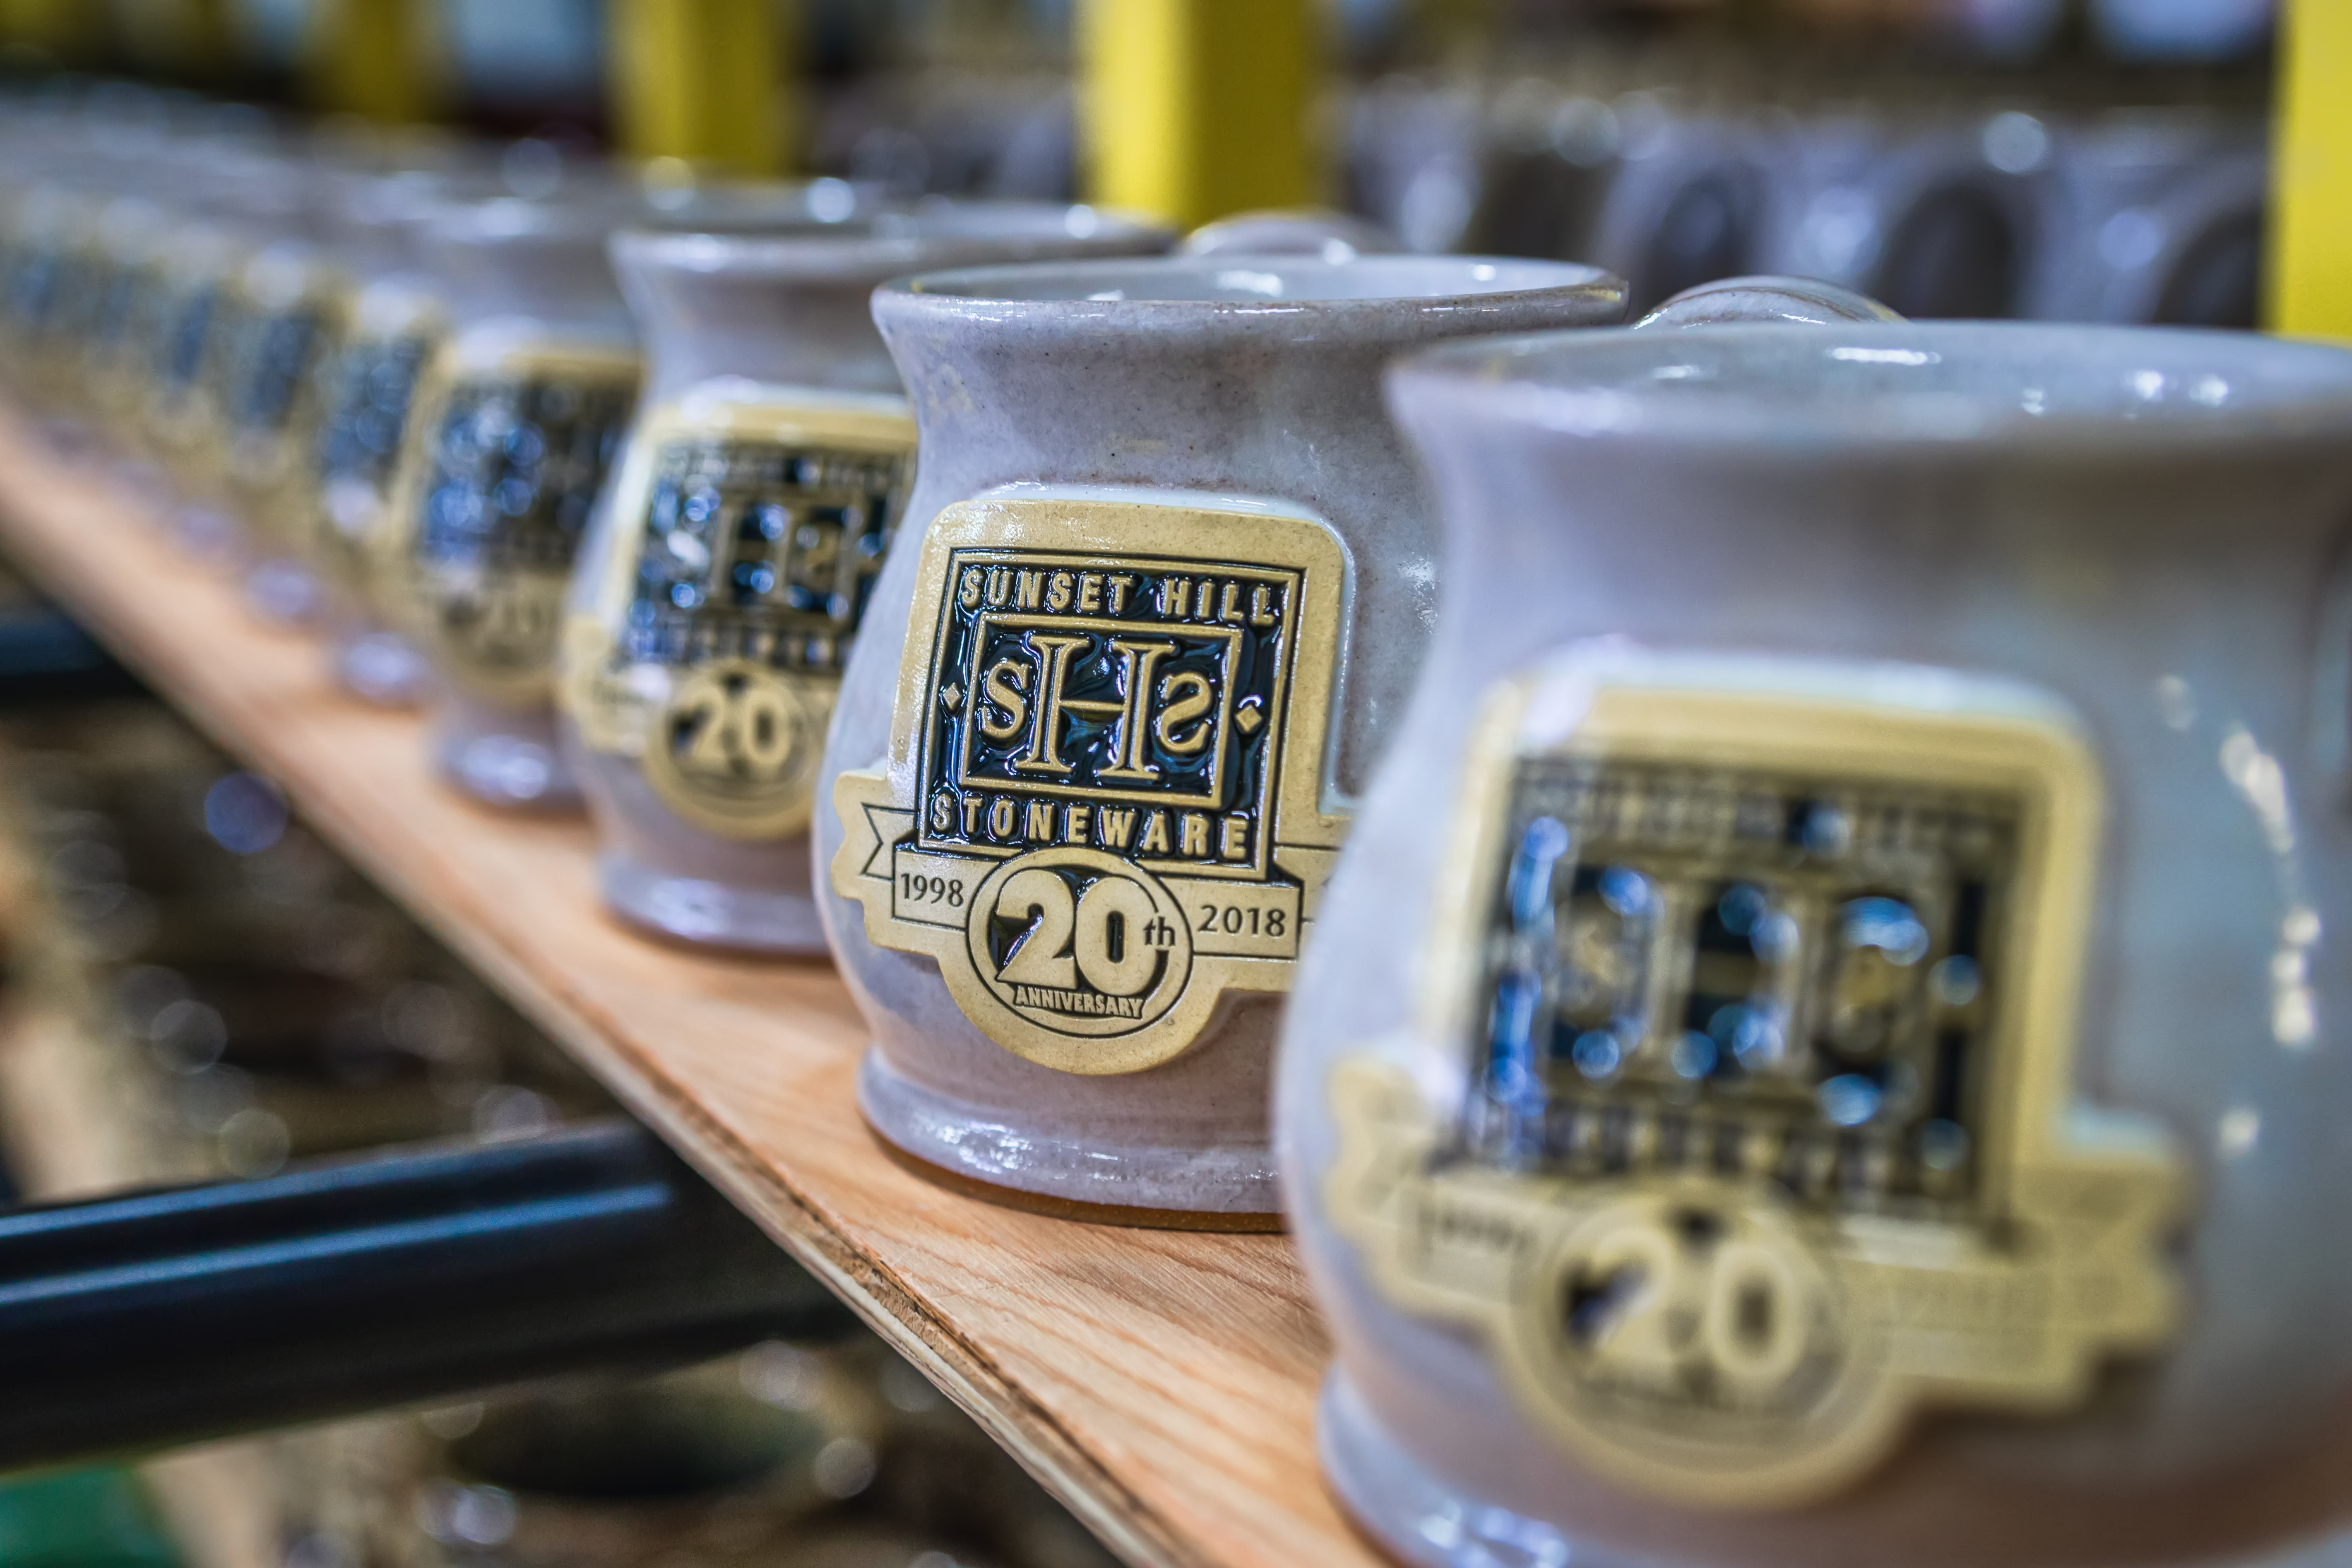 New glazes for your stoneware